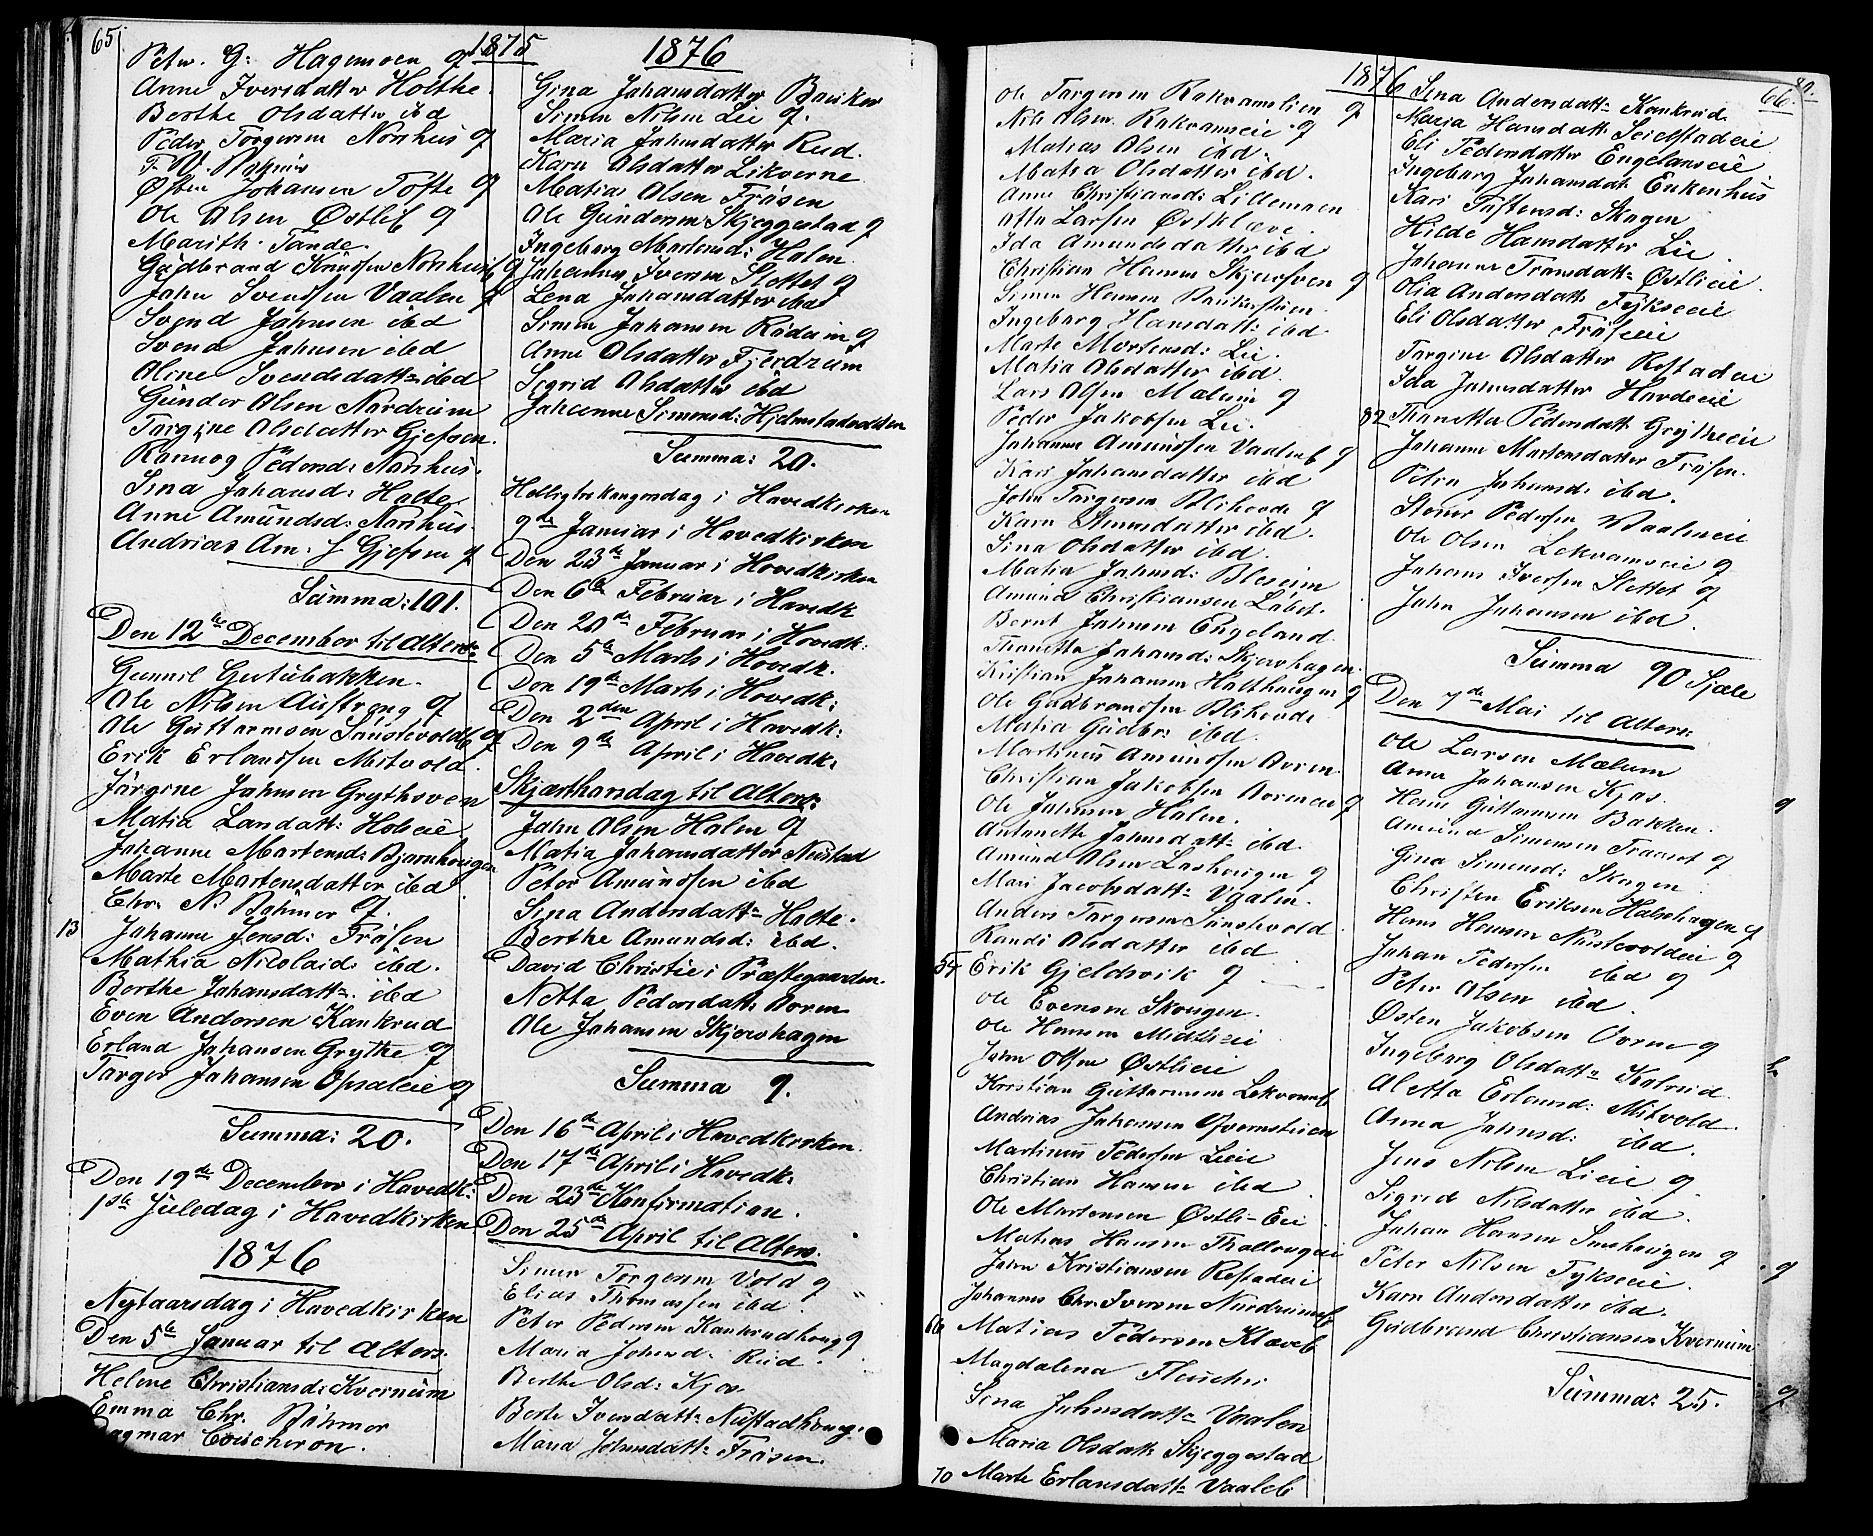 SAH, Østre Gausdal prestekontor, Klokkerbok nr. 1, 1863-1893, s. 65-66